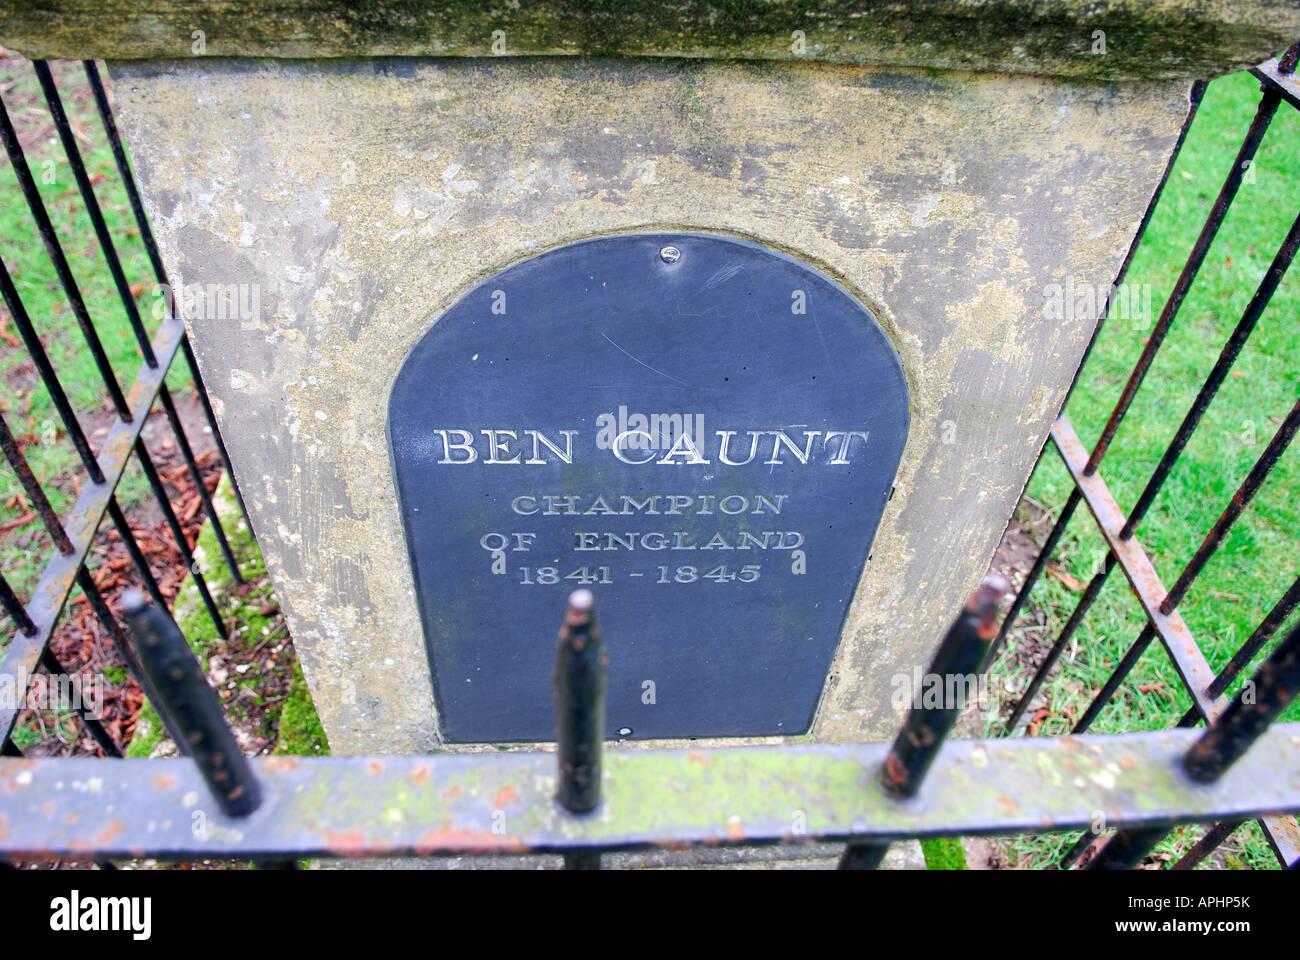 Benjamin Caunt.Champion Boxer of England. Stock Photo